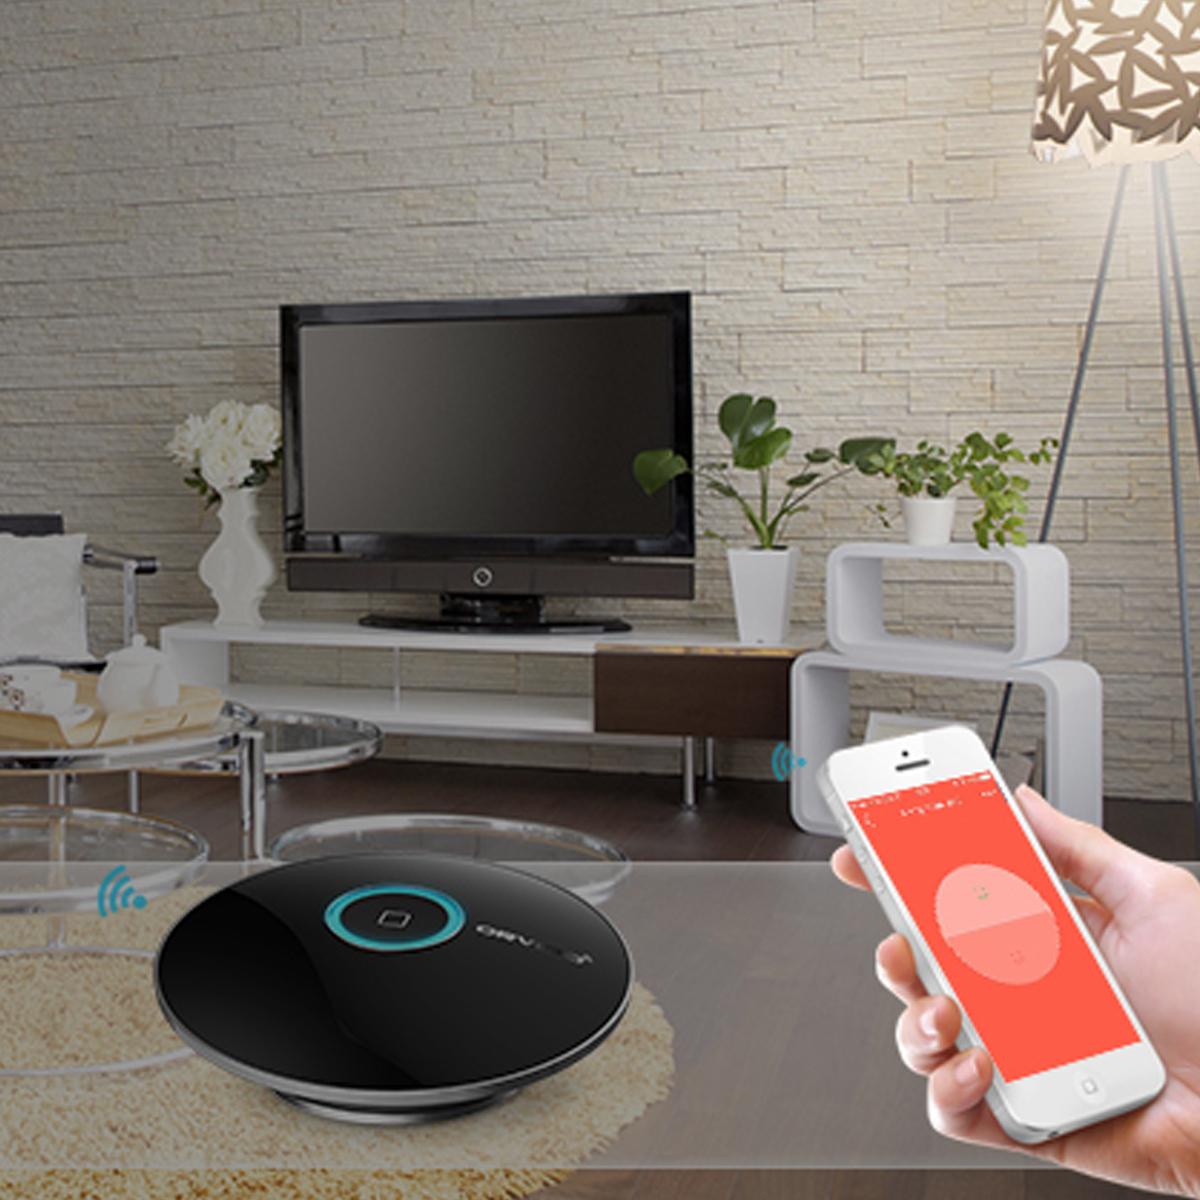 wifi internet ir rf smart home handy fernbedienung schalter orvibo allone schwarz ah004 in high. Black Bedroom Furniture Sets. Home Design Ideas